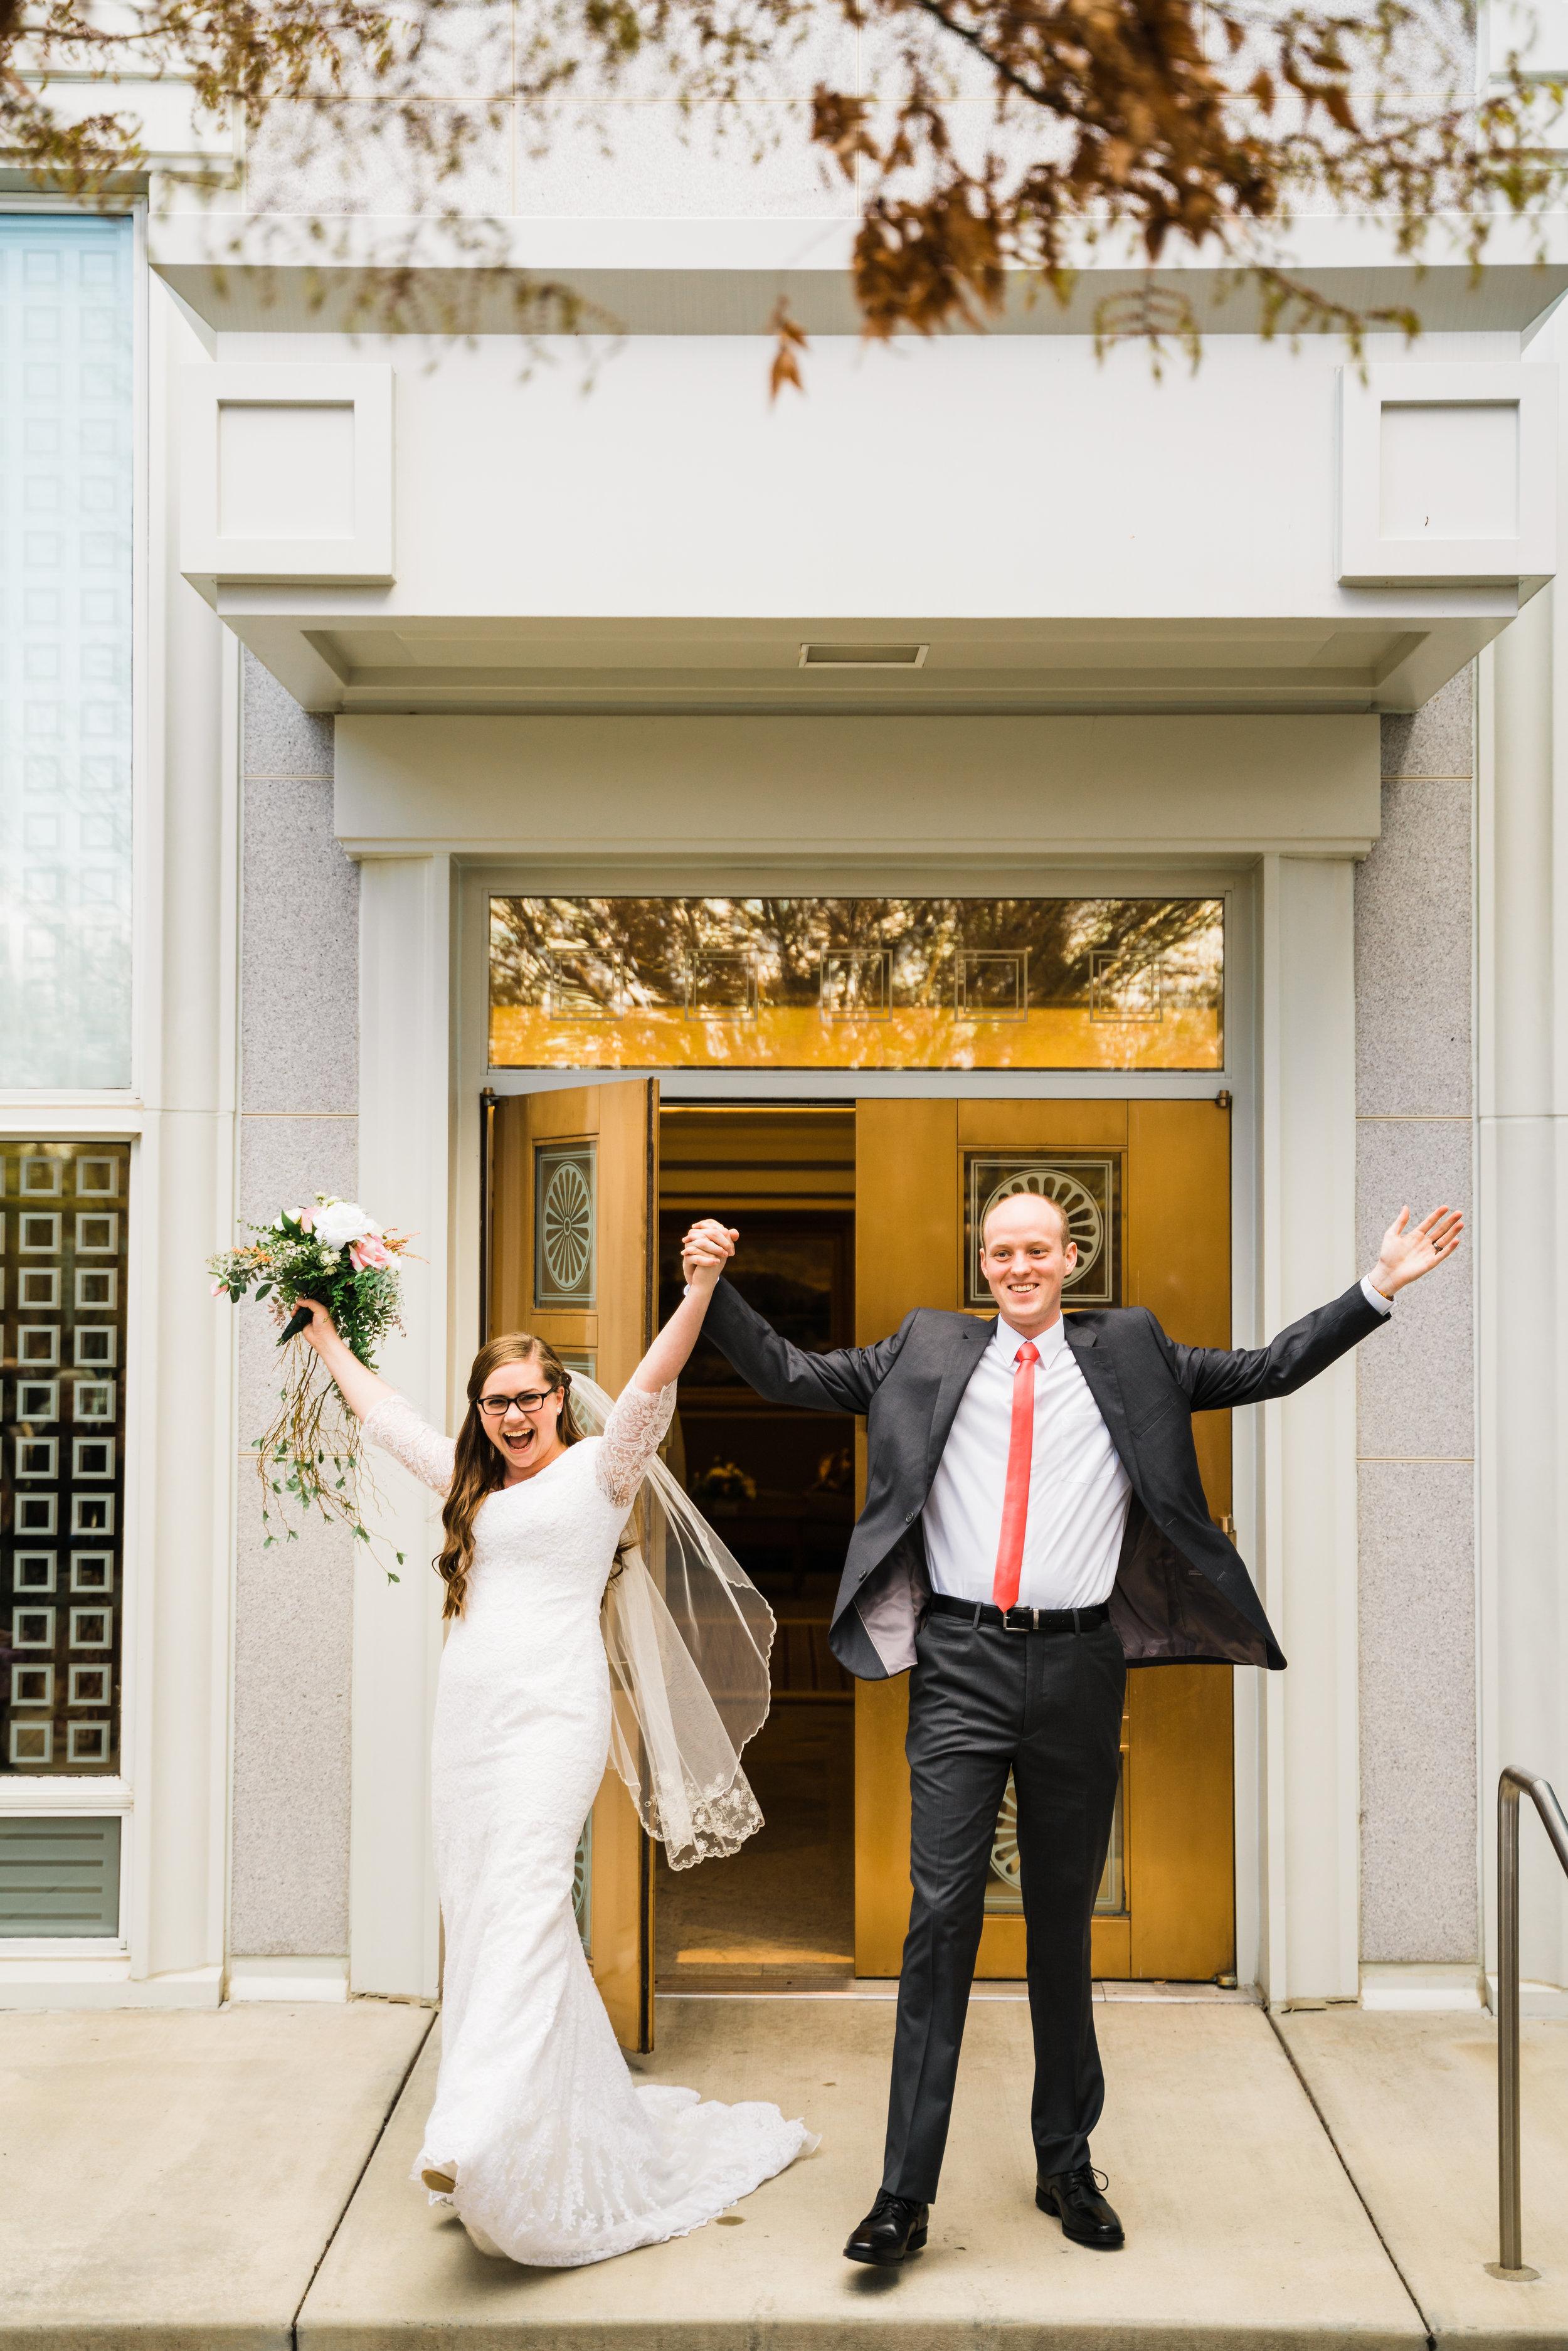 Leah and Spencer Mount Timpanogos Wedding Christine Madeux Photography Rexburg Idaho Photographer